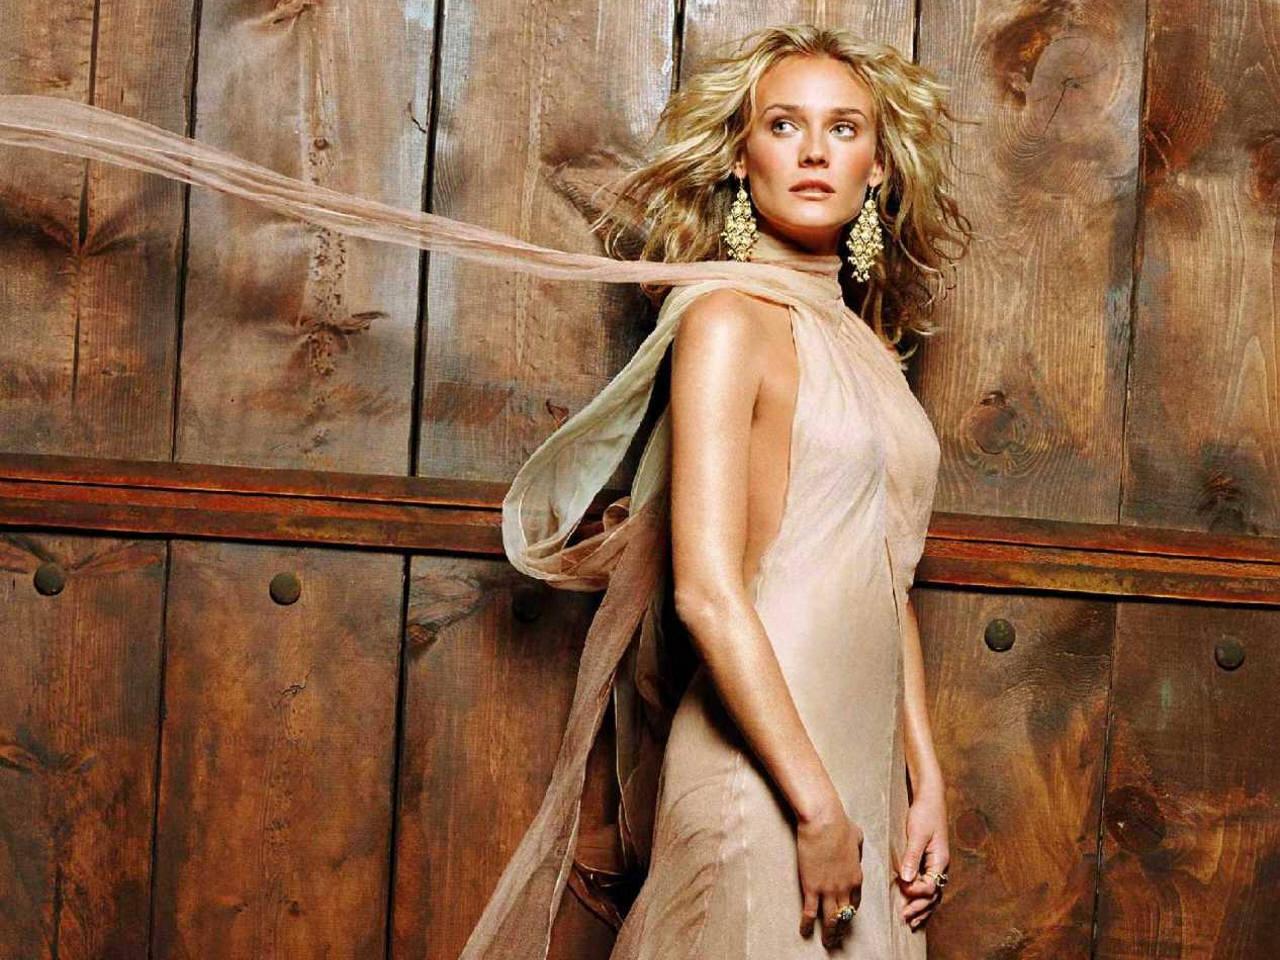 http://1.bp.blogspot.com/_cZuaghvCasw/TGFlNoWDMjI/AAAAAAAAJ9c/hi8lh2EPZ8s/s1600/Diane-Kruger-Wallpapers-01.jpg